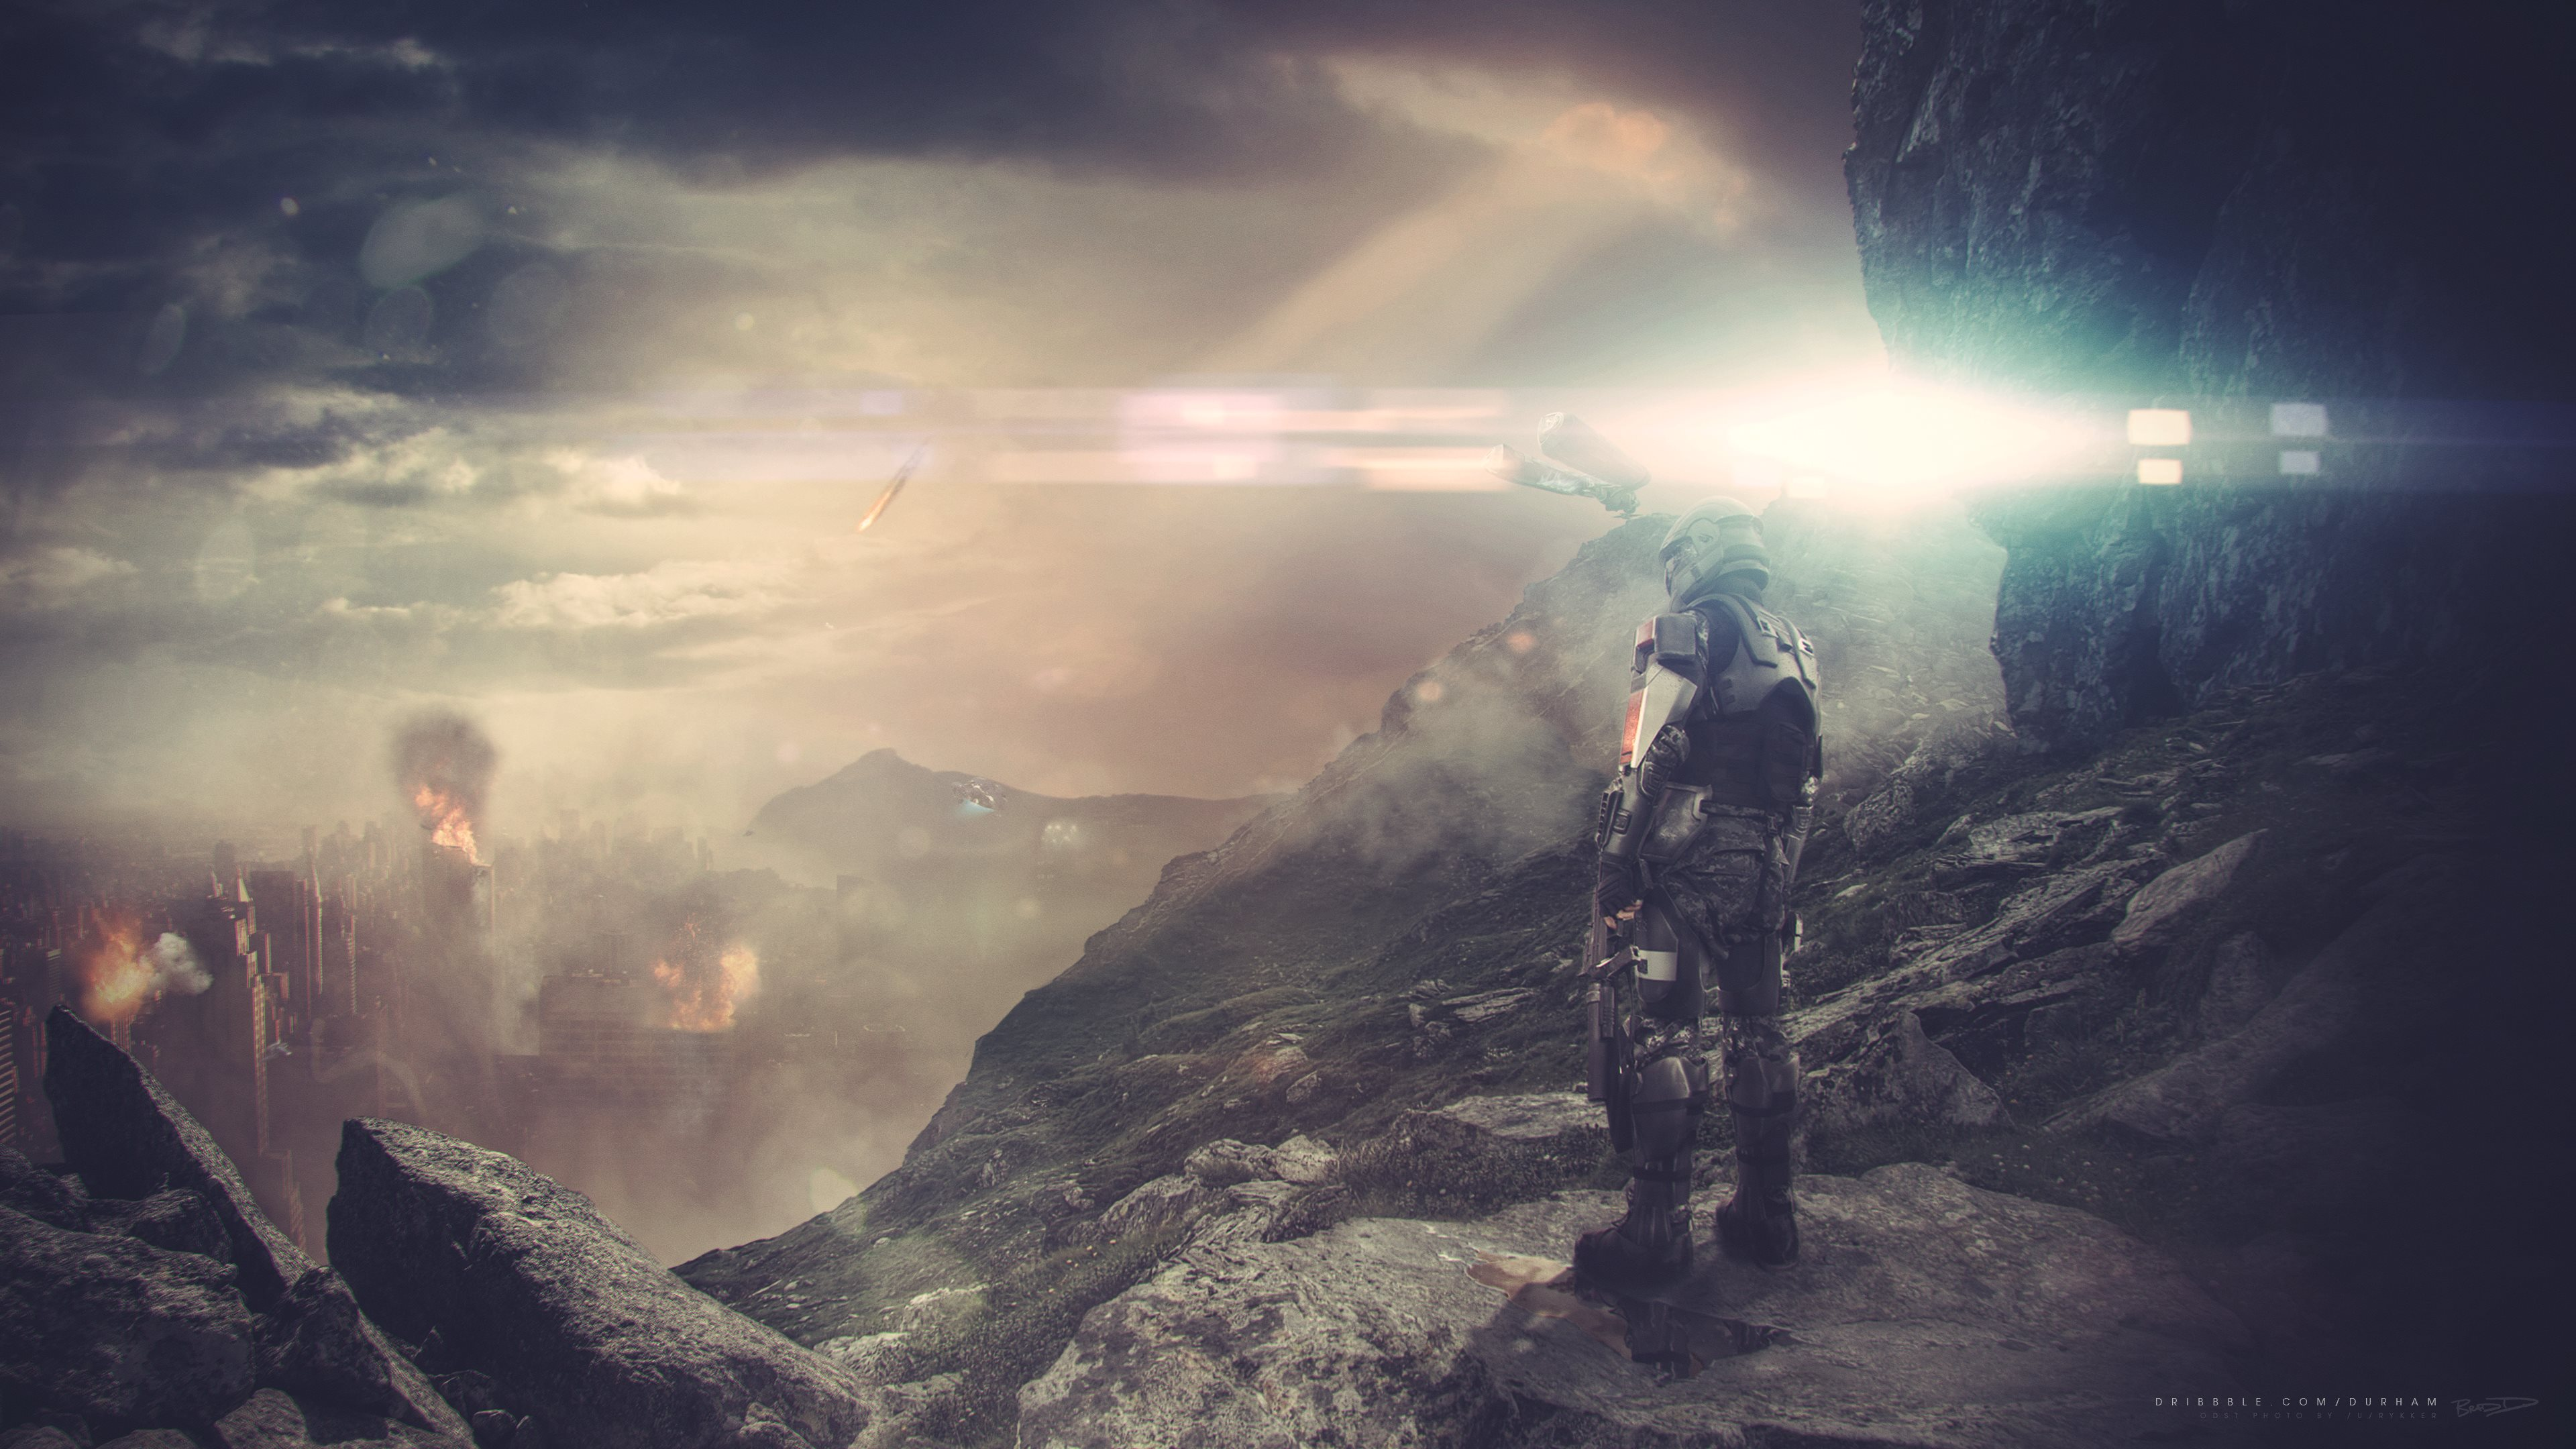 Halo 3 Odst 4k Ultra Hd Wallpaper Background Image